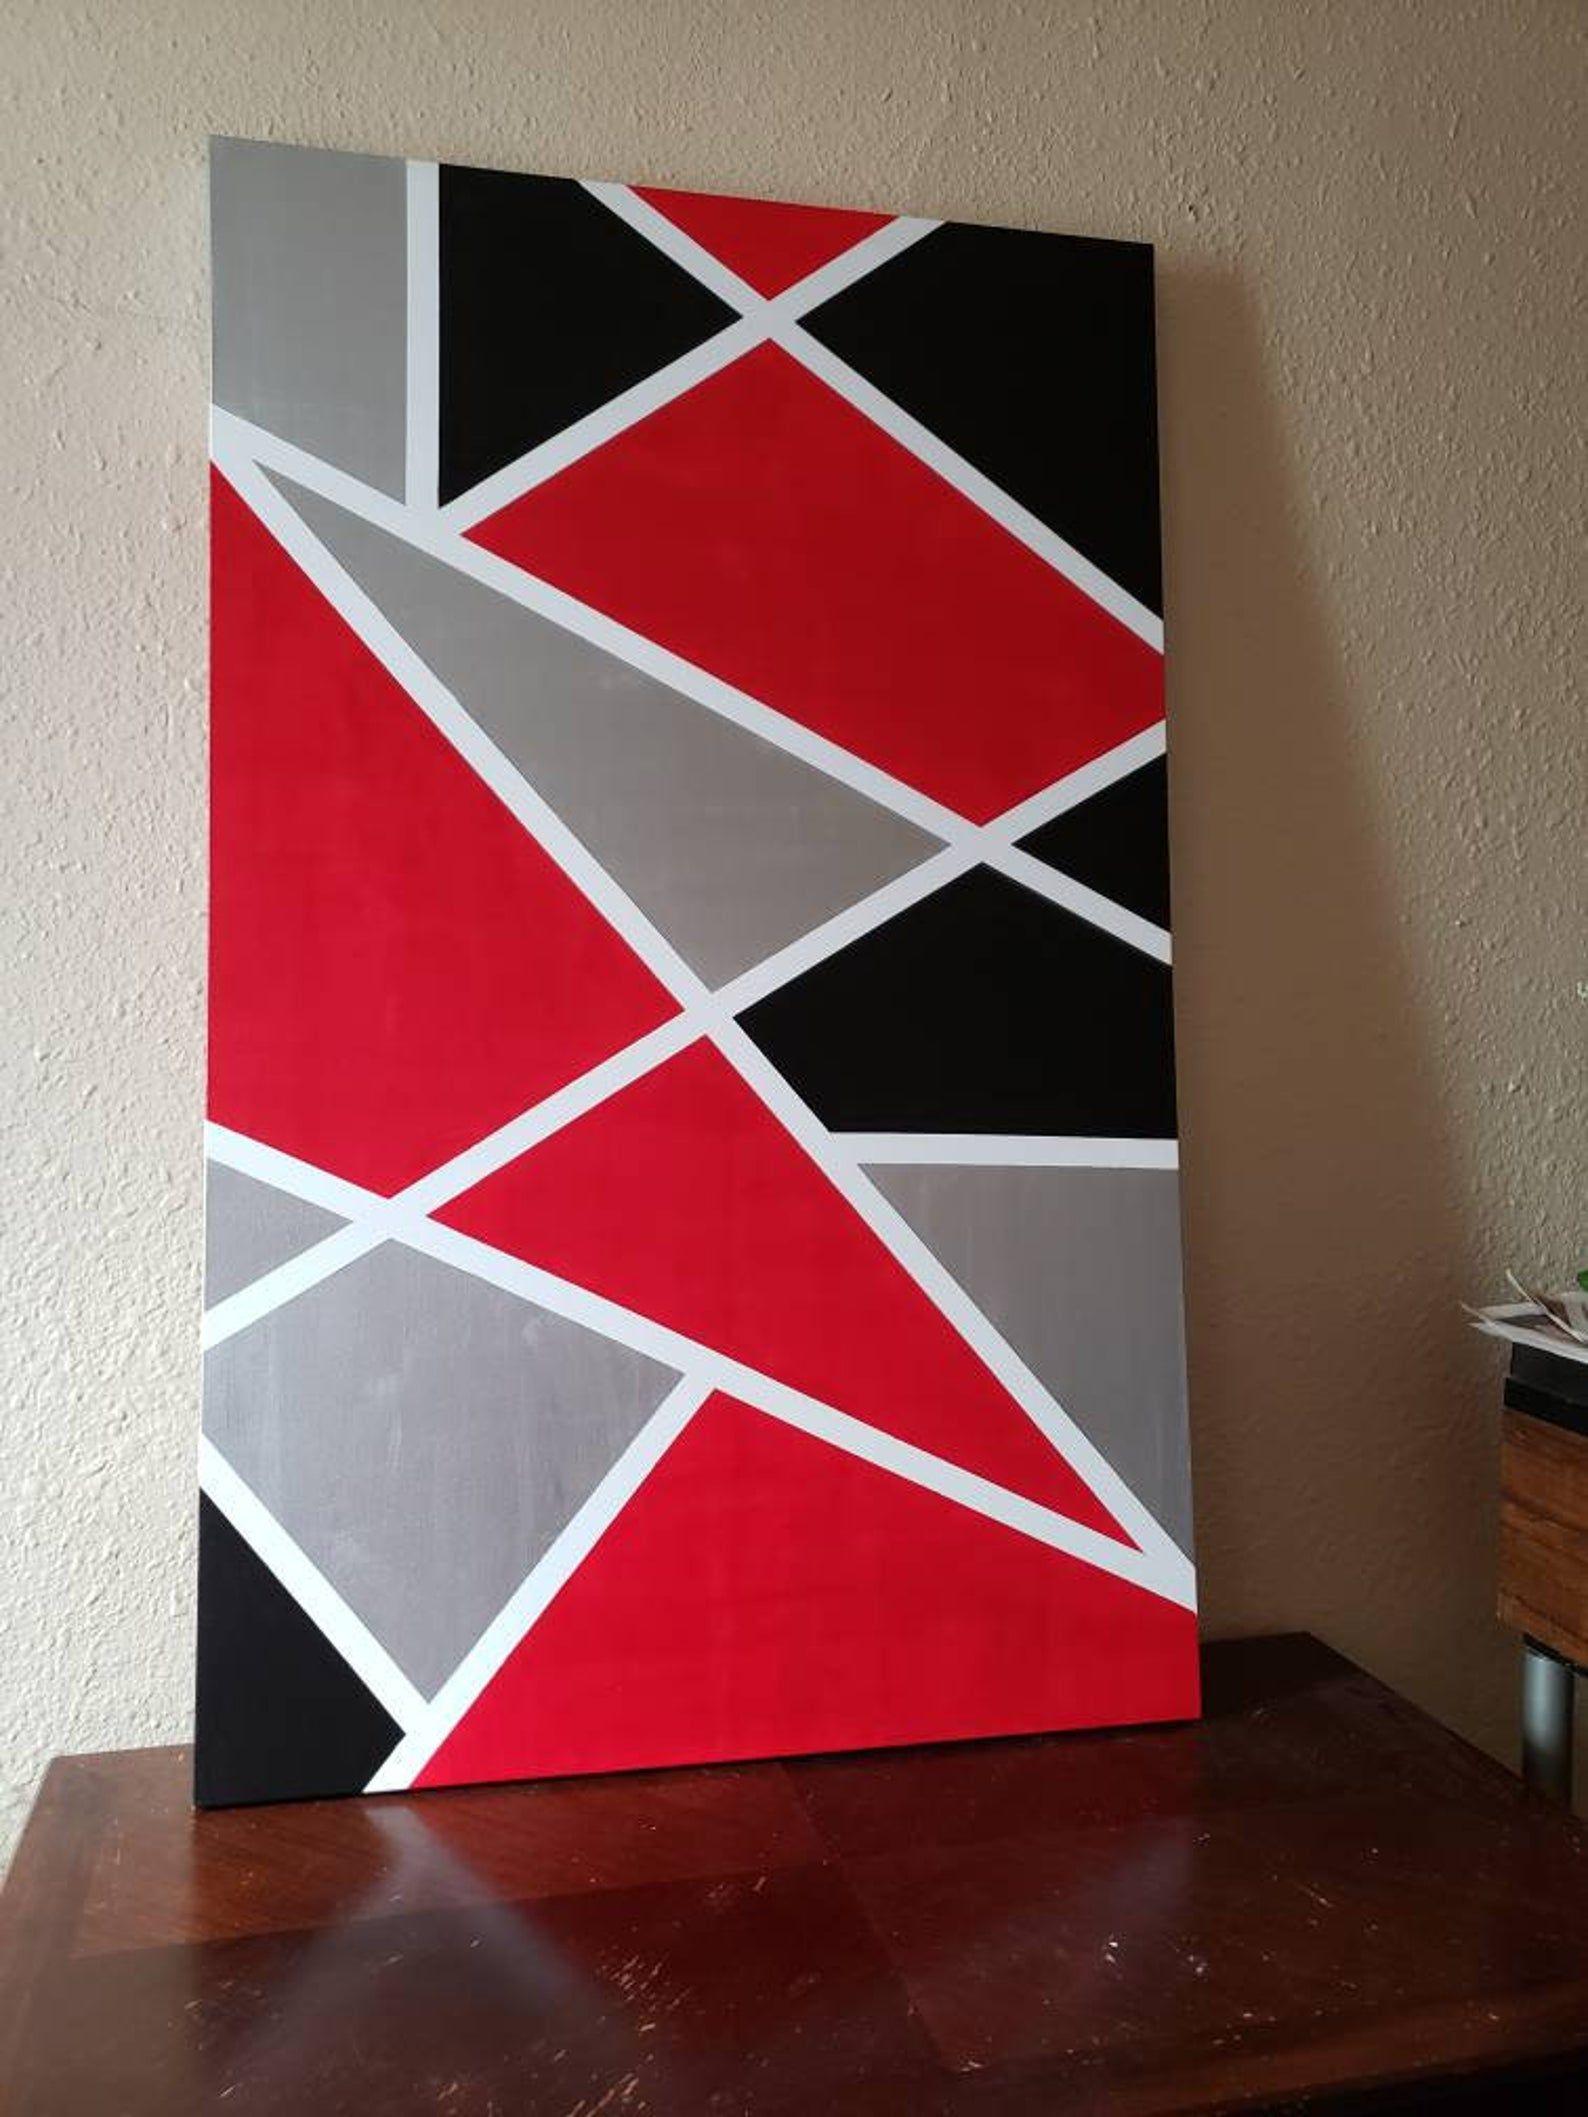 Pin By وليد الطربانى On وليد In 2020 Geometric Wall Paint Canvas Art Wall Decor Diy Wall Painting